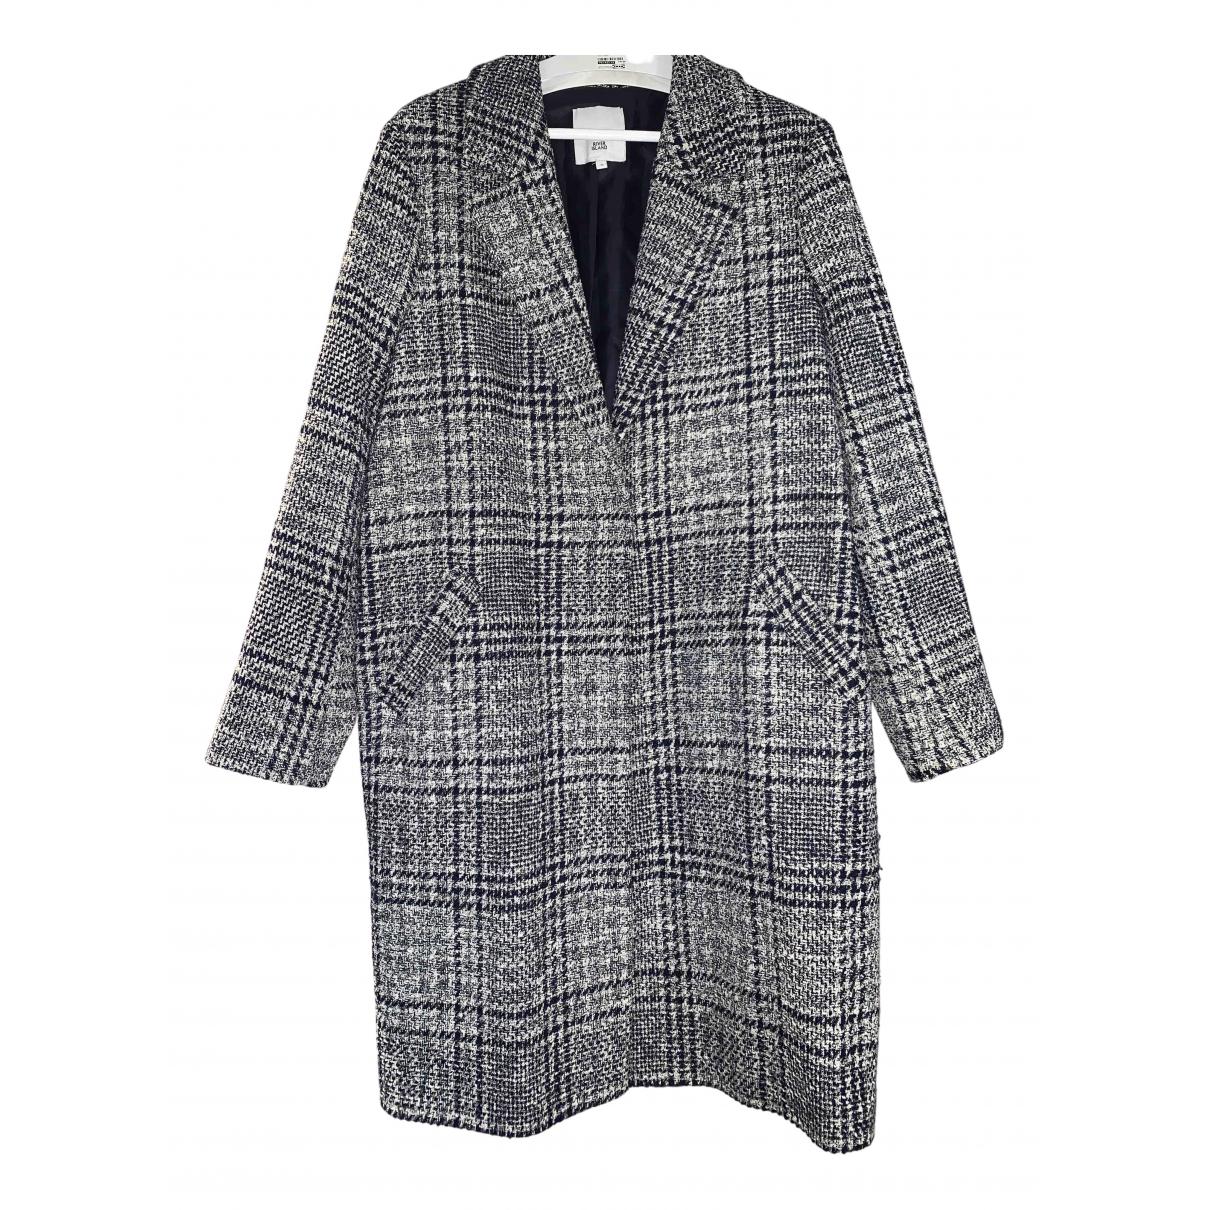 River Island N Tweed coat for Women 16 UK